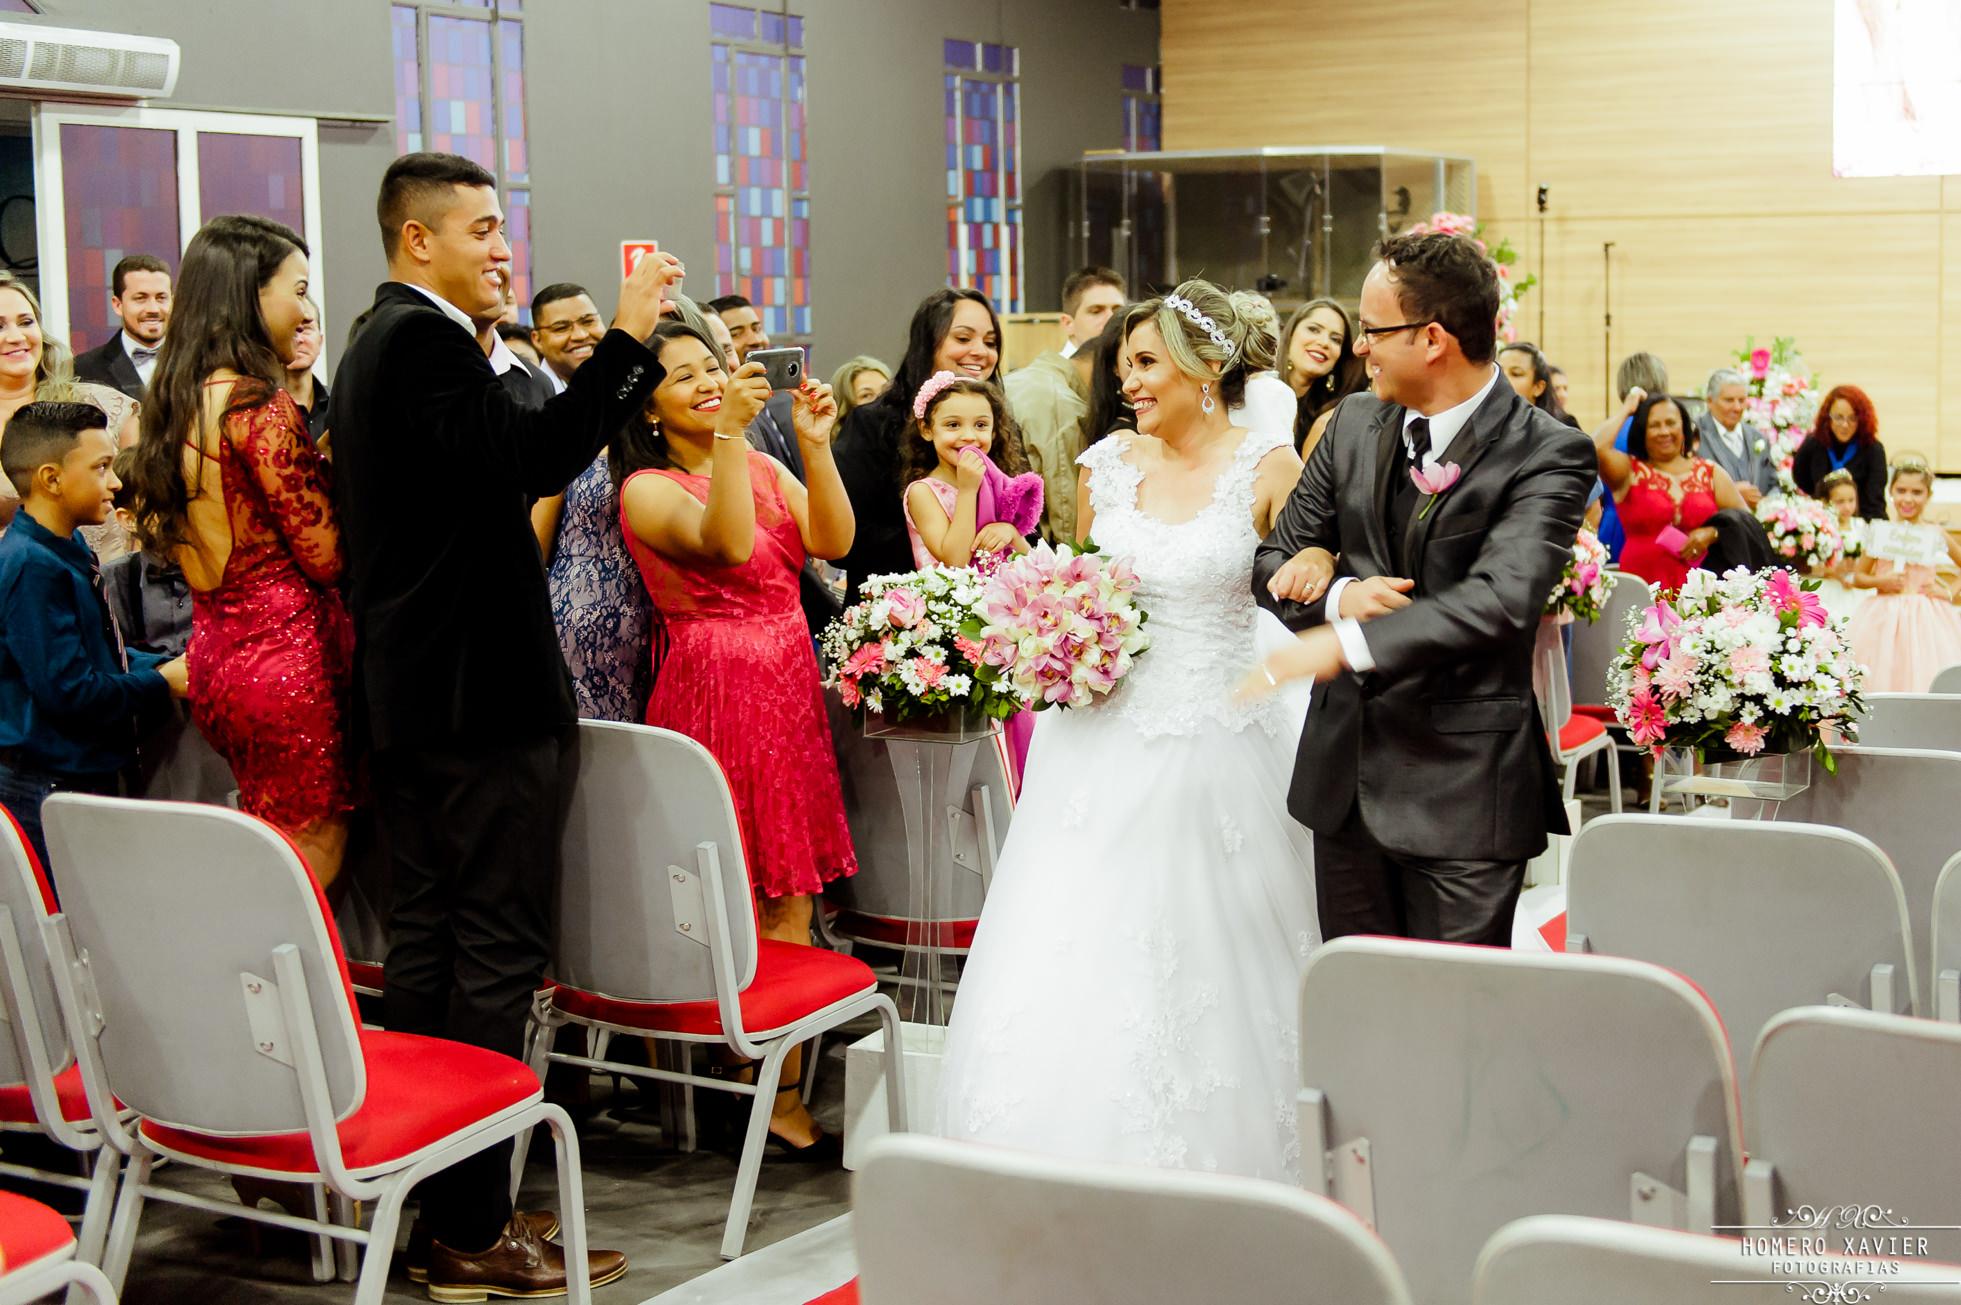 fotos casamento Igreja Batista da Pampulha BH